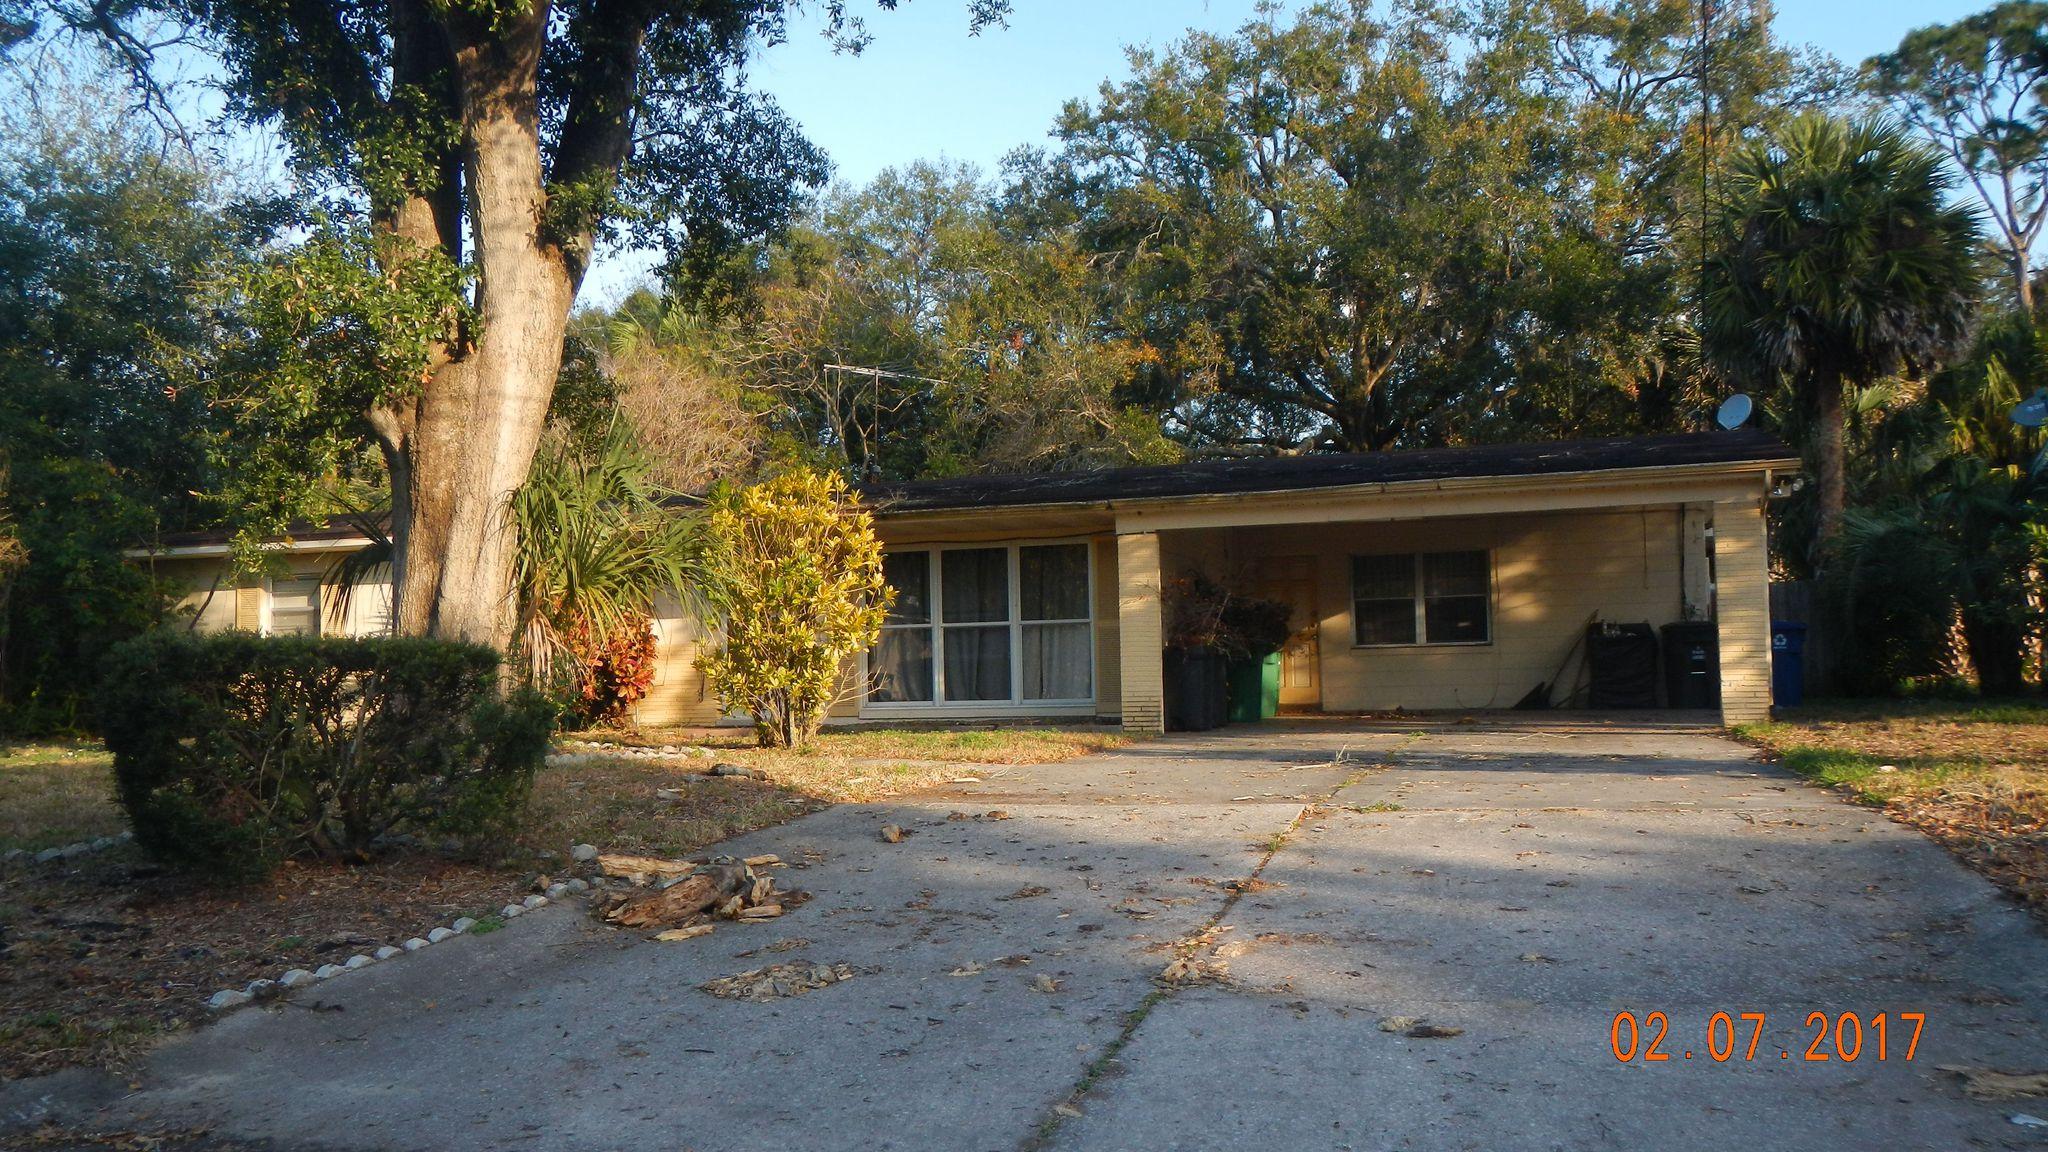 1835 Albert Lee Pkwy, Winter Park, FL 32789 - Foreclosure   Trulia